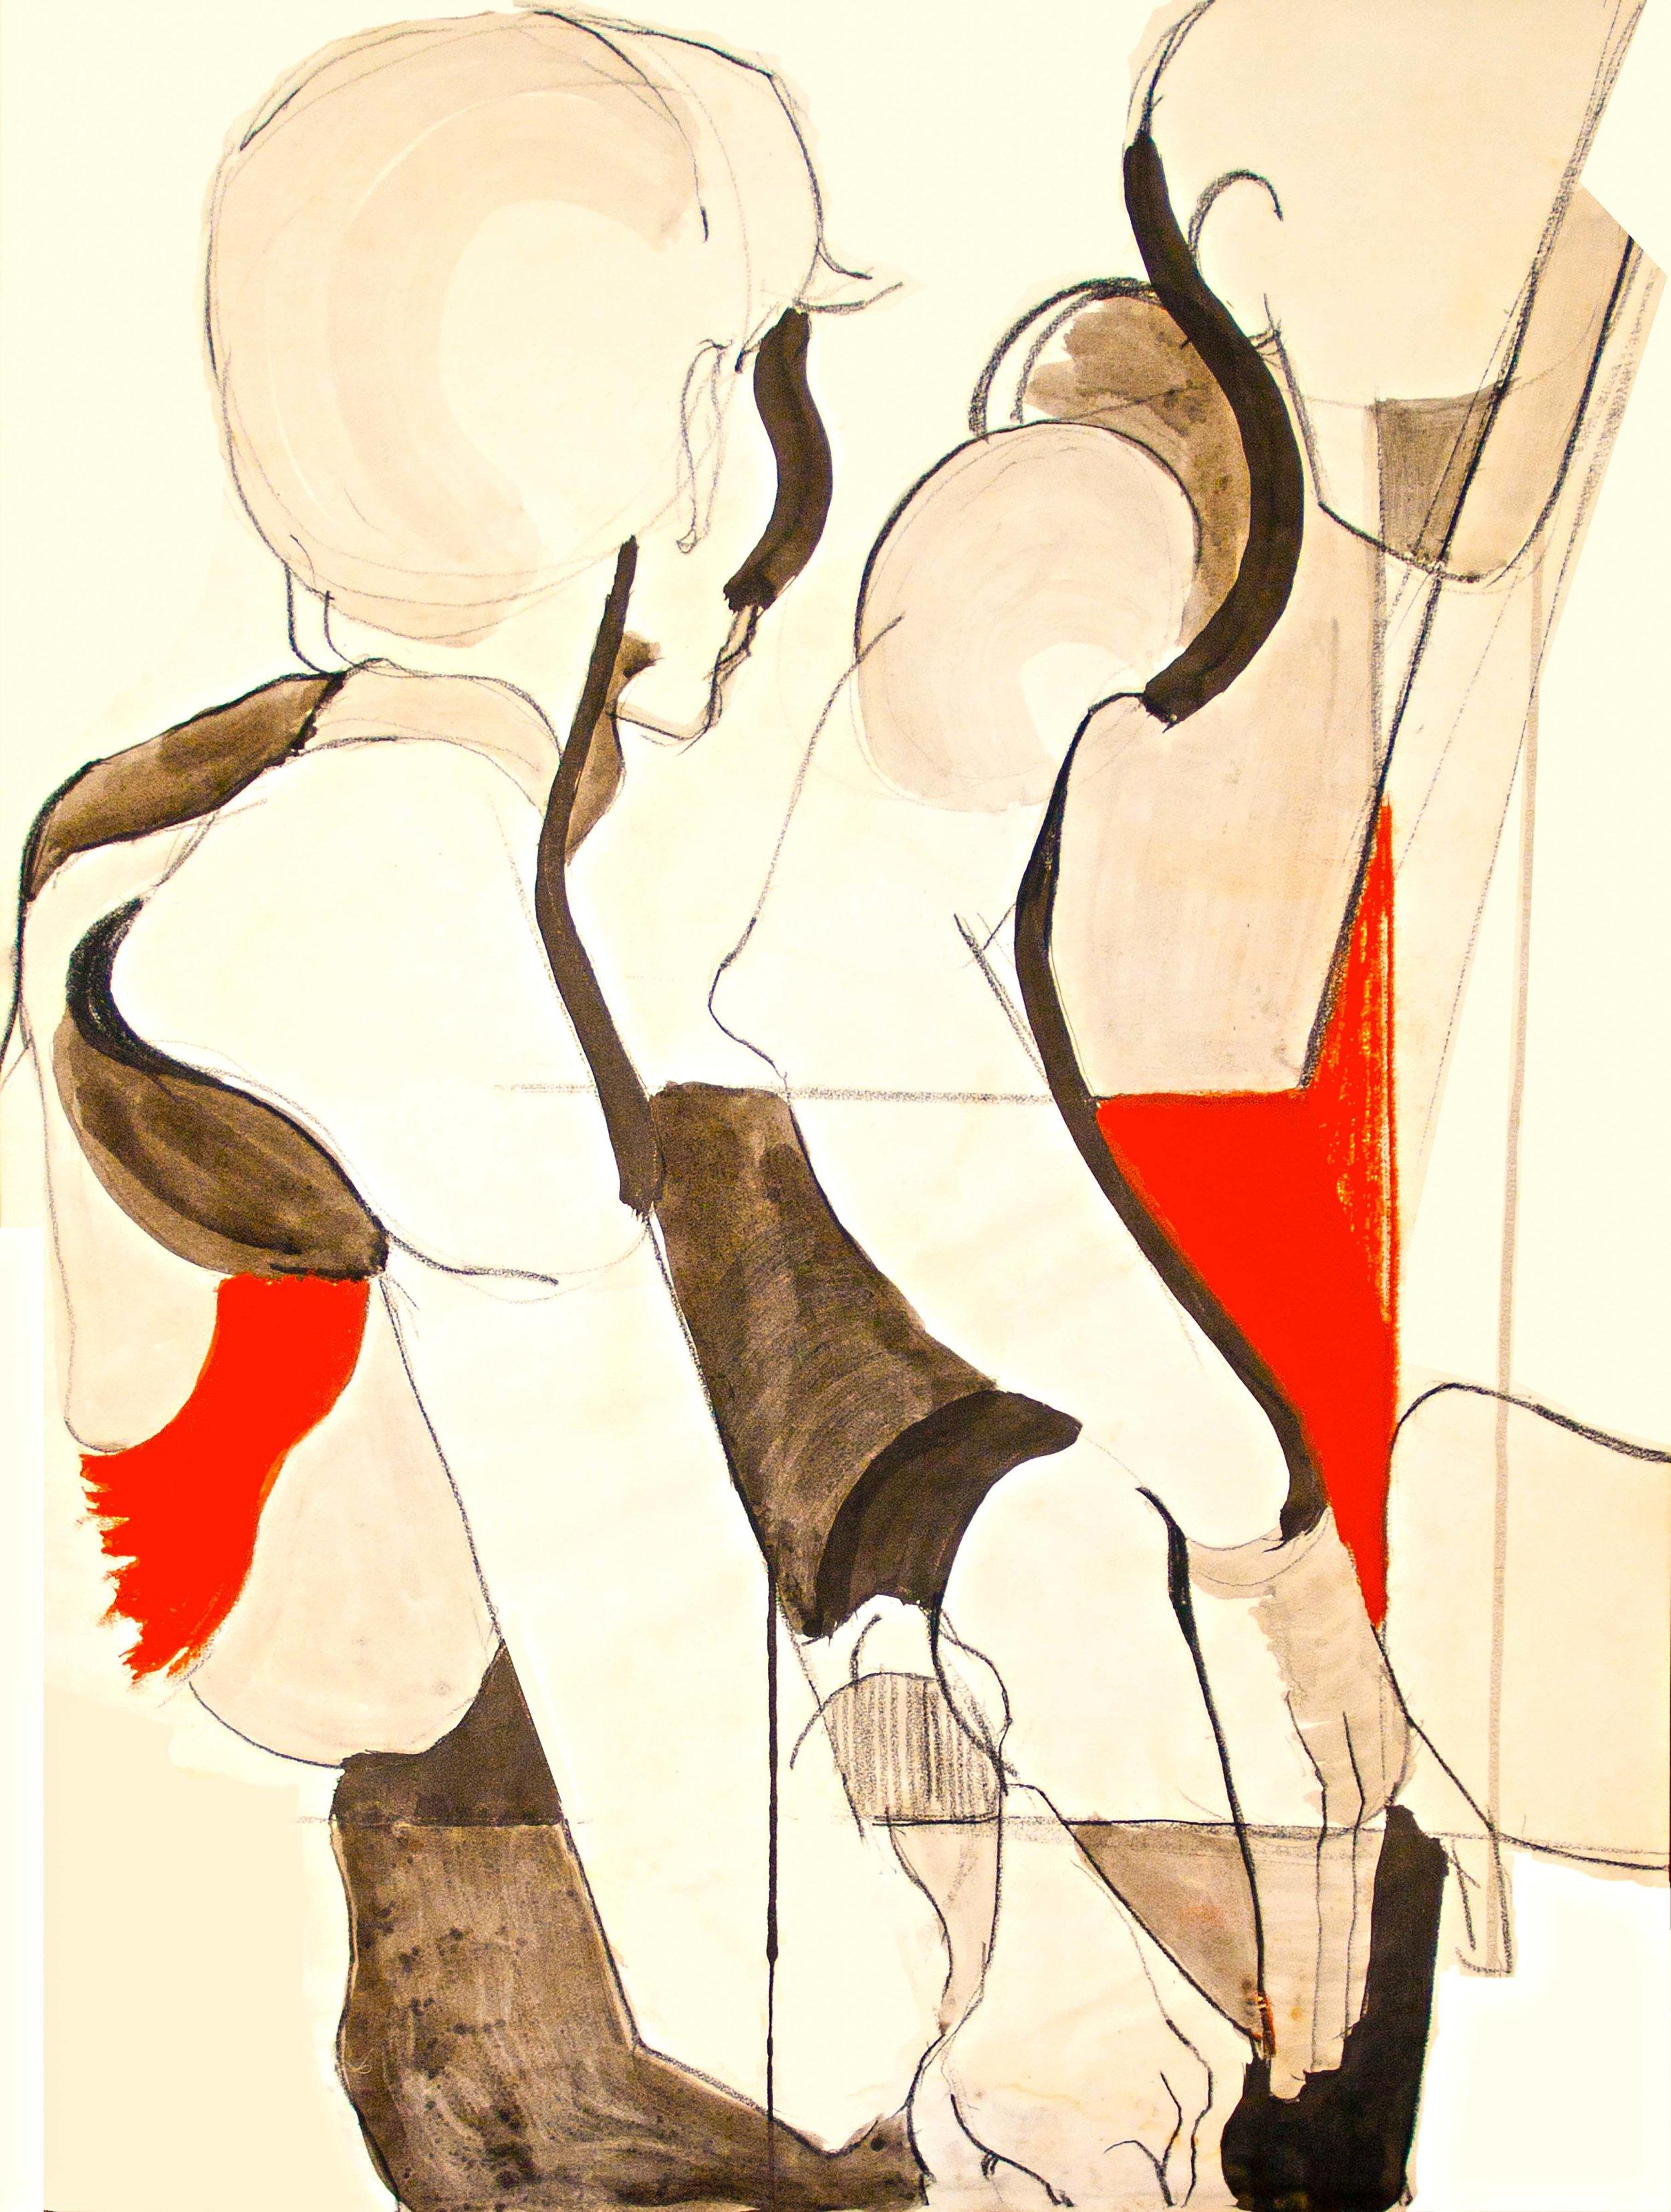 """Boys"" by Sid Webb,Ink & conte crayon, digital restoration, 16x20in, 1967, $2200"